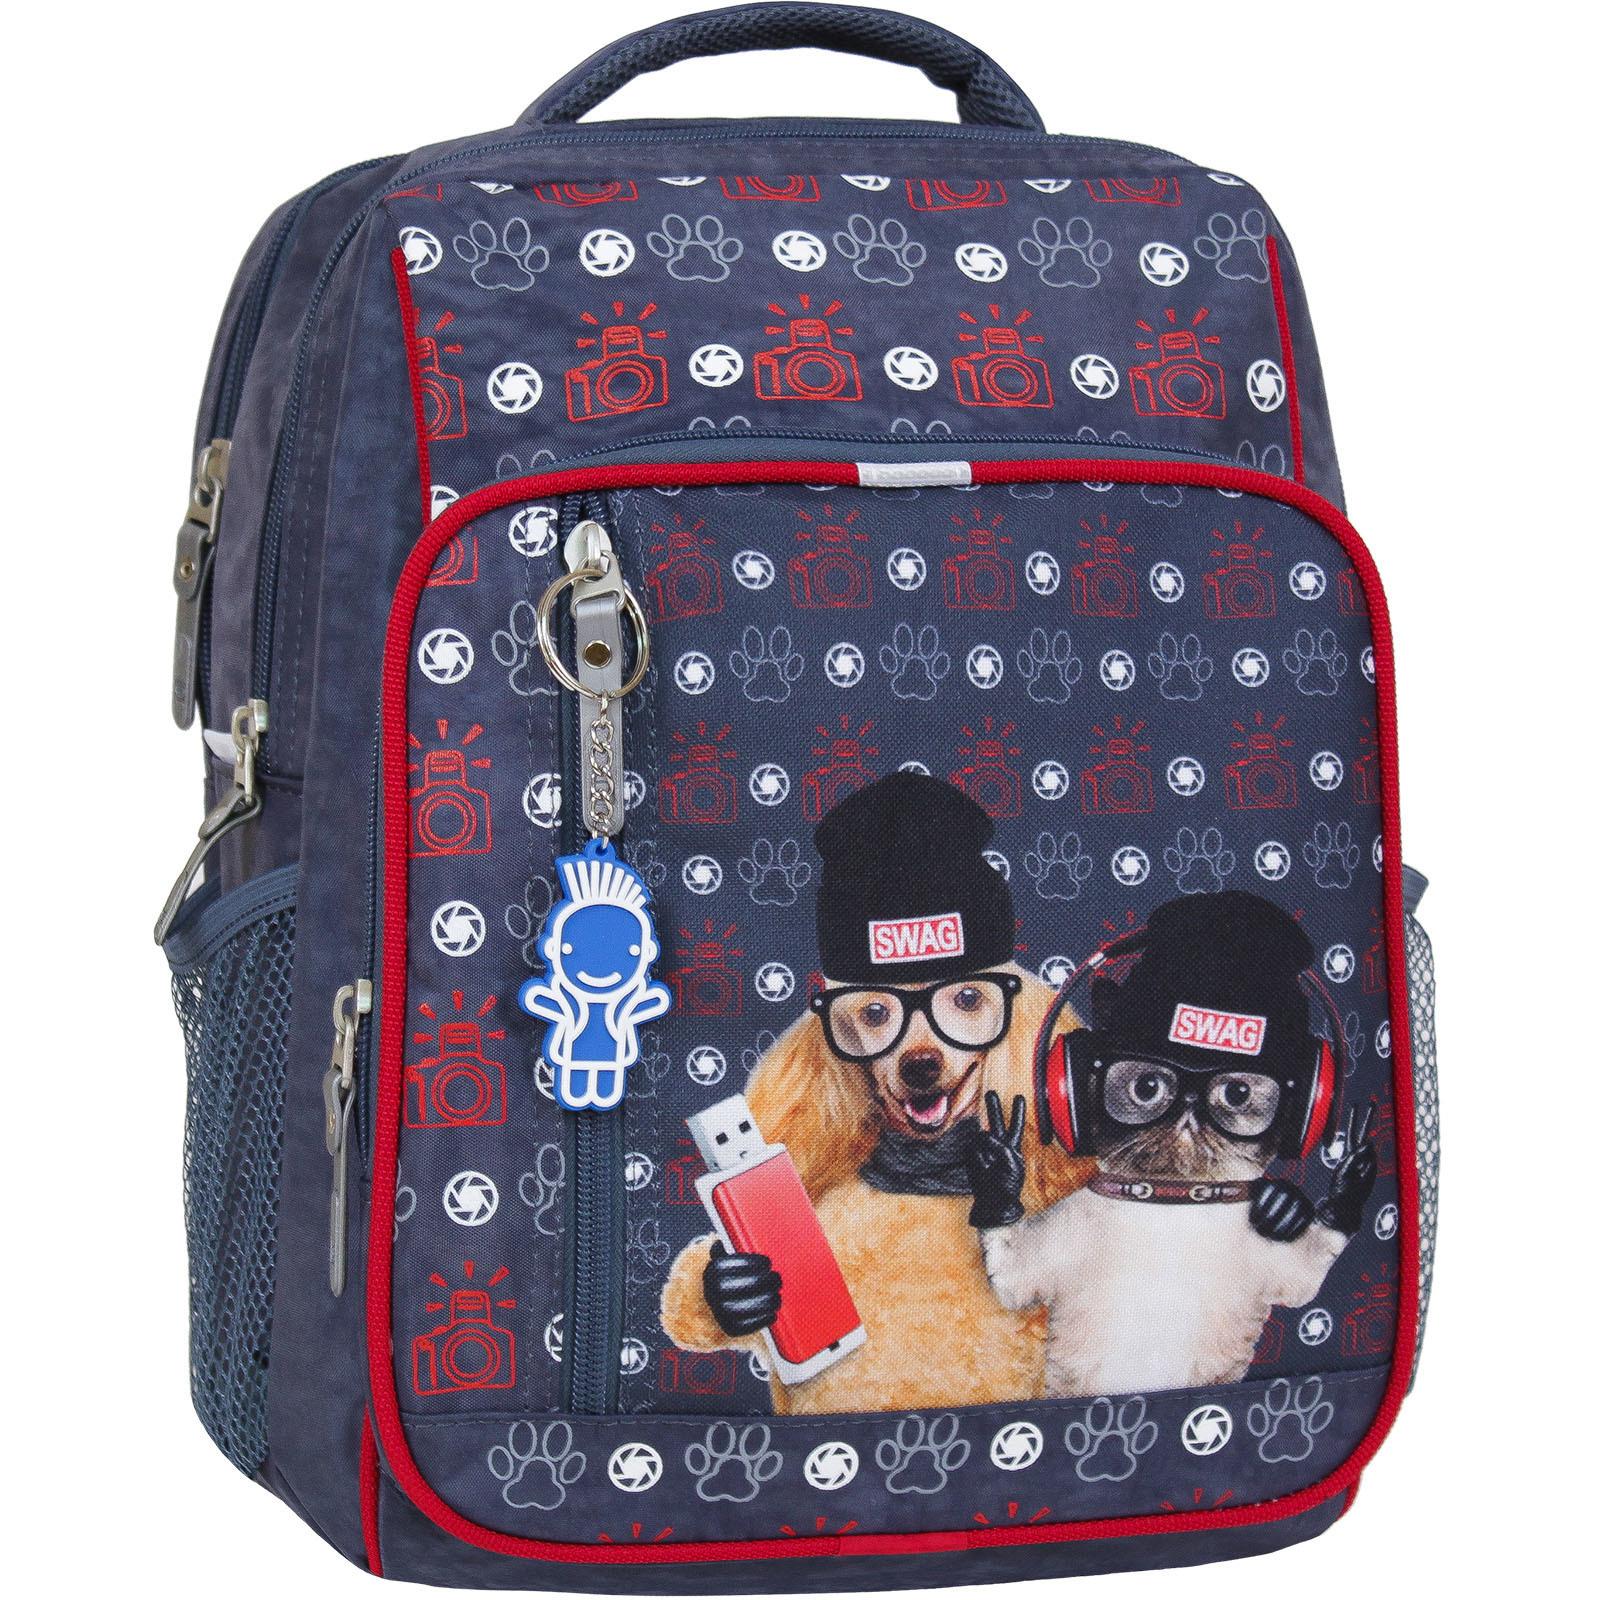 Школьные рюкзаки Рюкзак школьный Bagland Школьник 8 л. 321 серый 188к (00112702) IMG_4863-суб188к.jpg